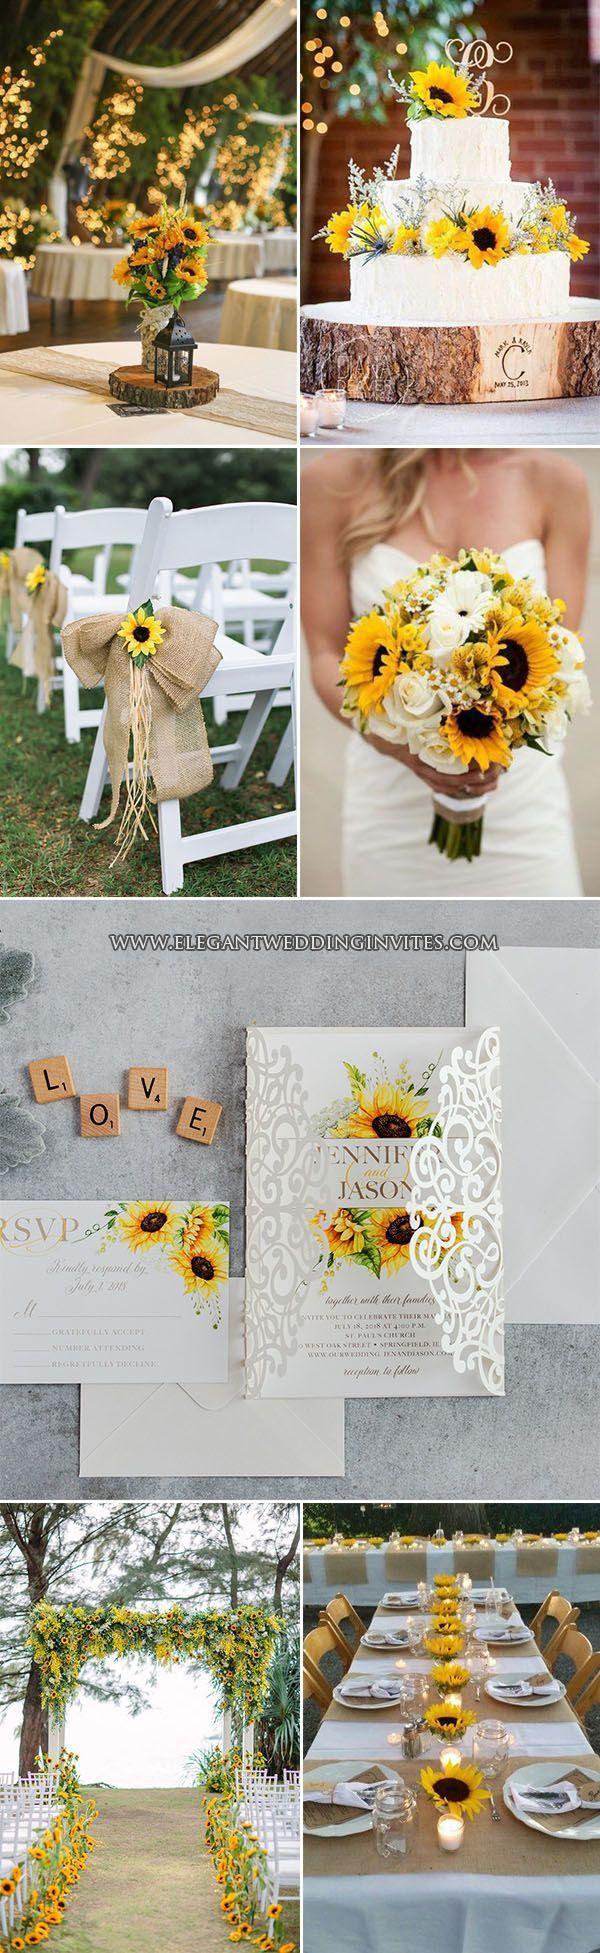 sunflower rustic wedding ideas #weddingideas